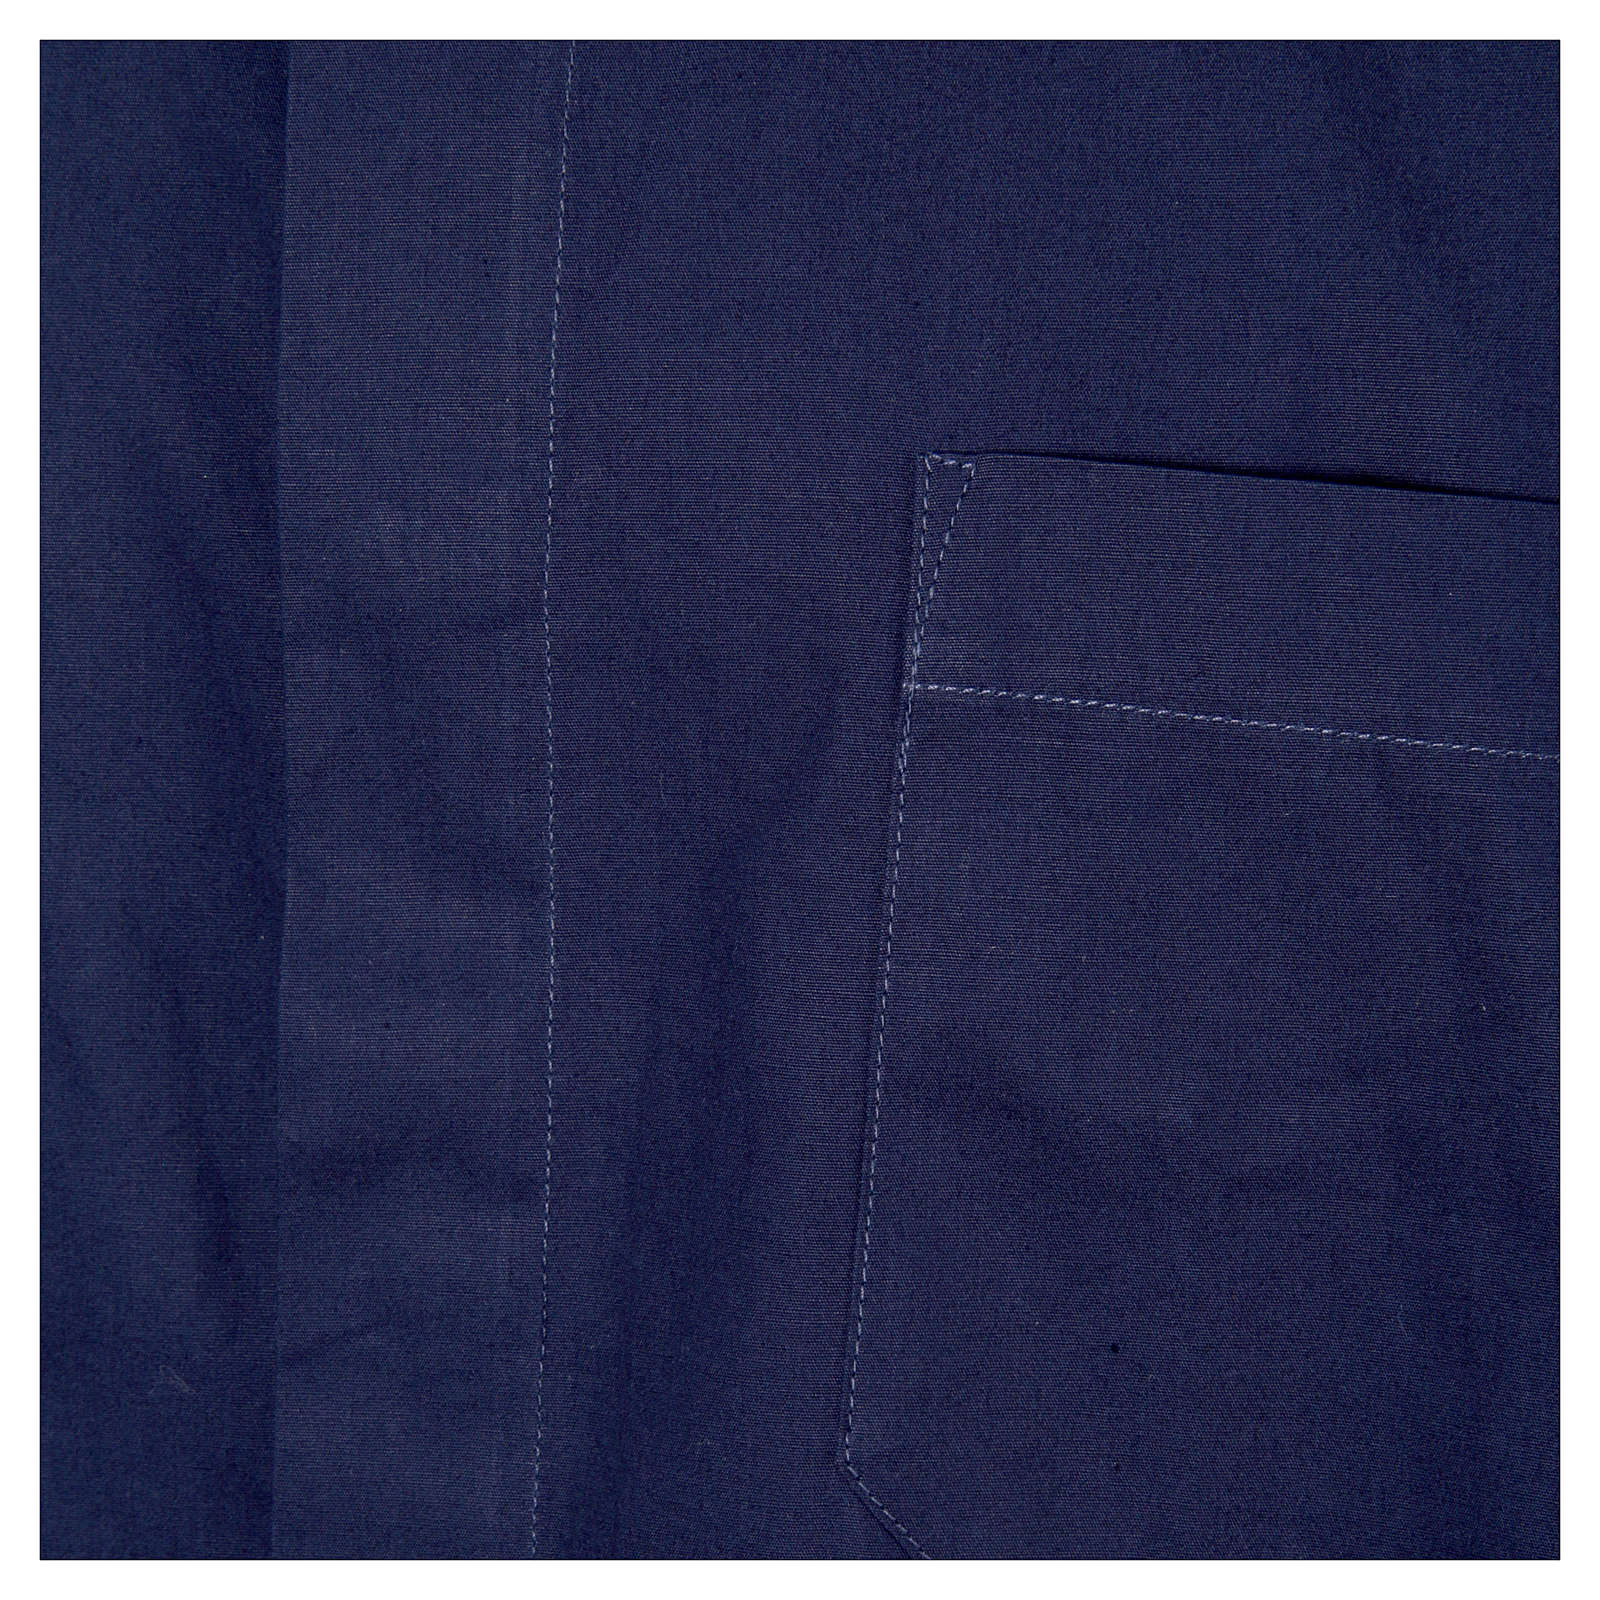 STOCK Camicia clergyman manica corta popeline blu 4